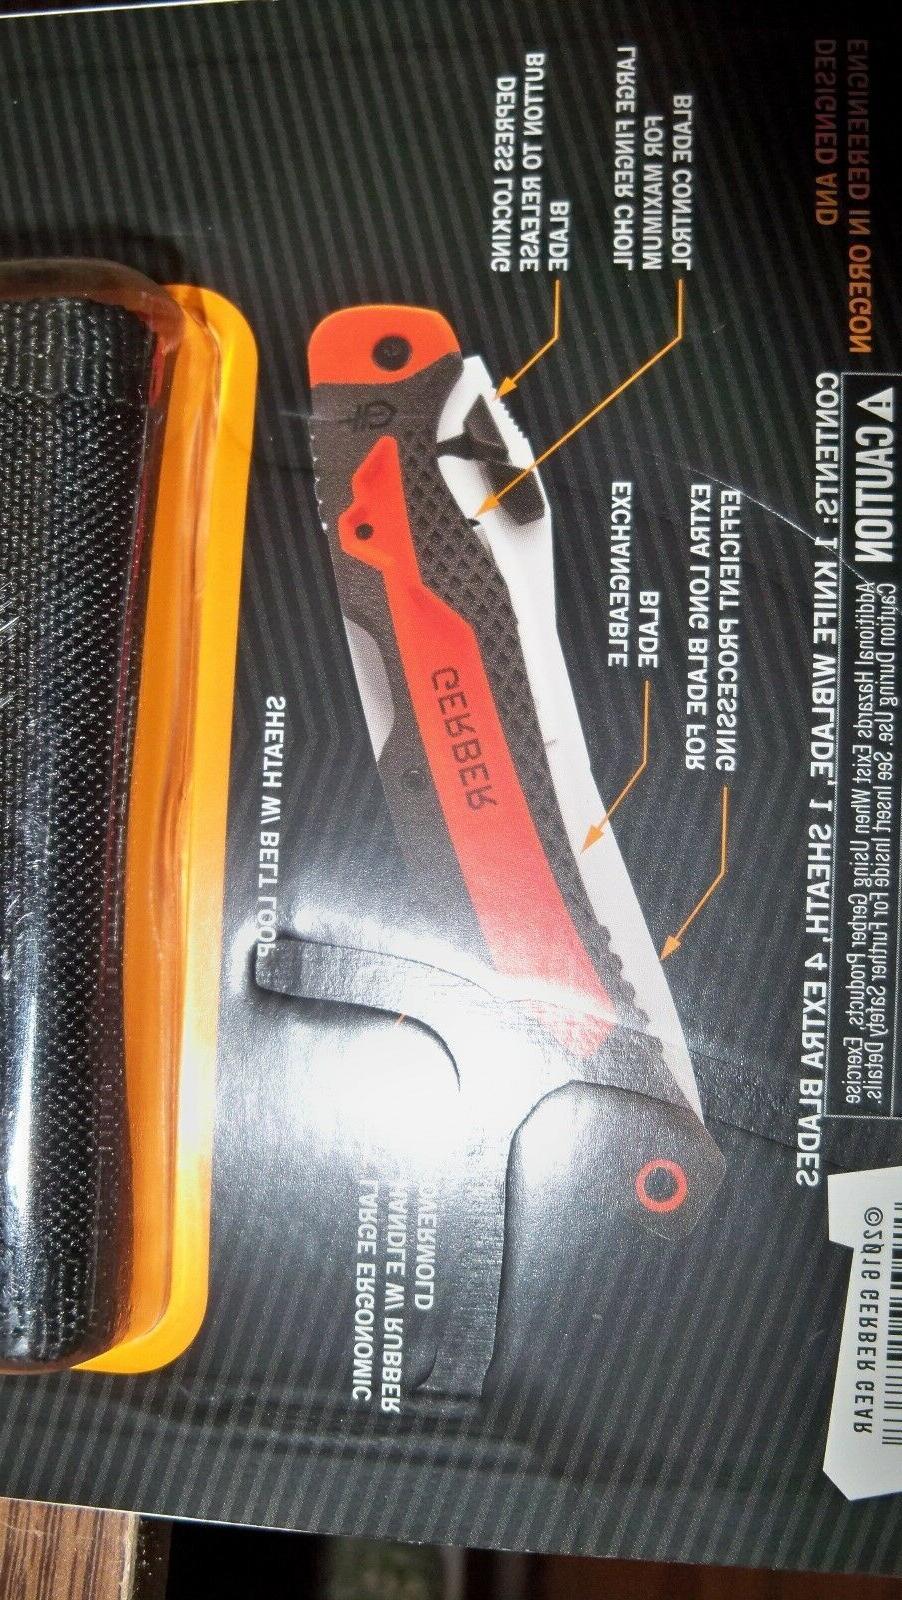 Gerber Vital Big Folder Knife w/4 Replacement skinning